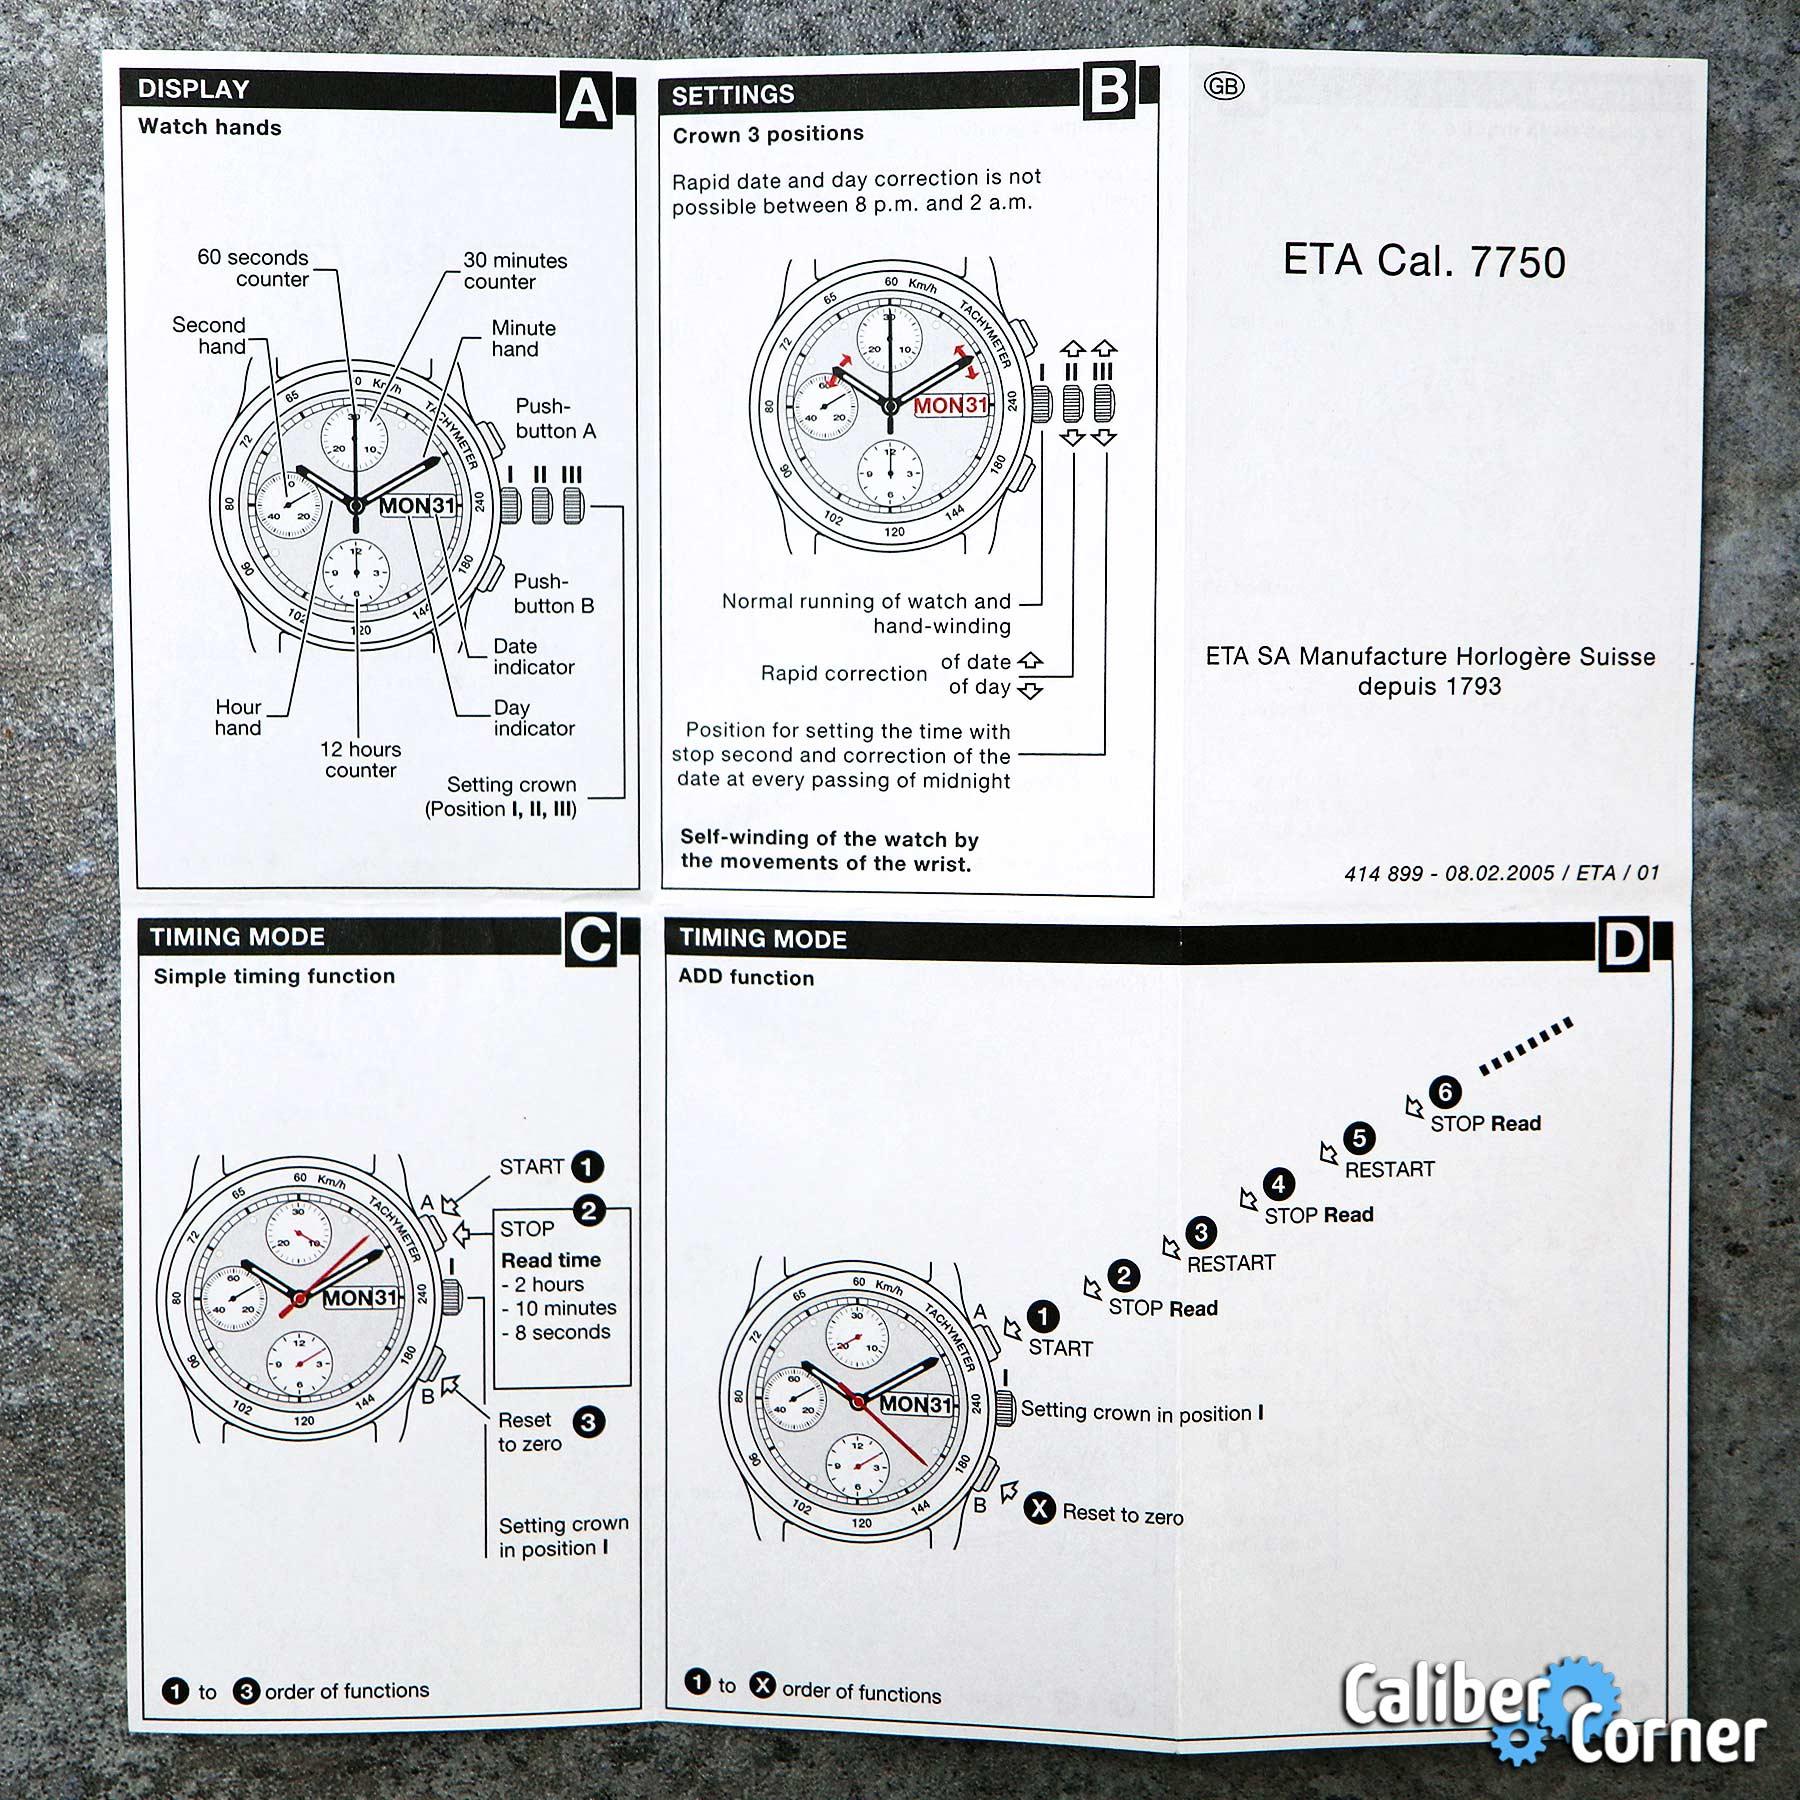 Eta Caliber 7750 Instructions - 414 889 02-02-2005